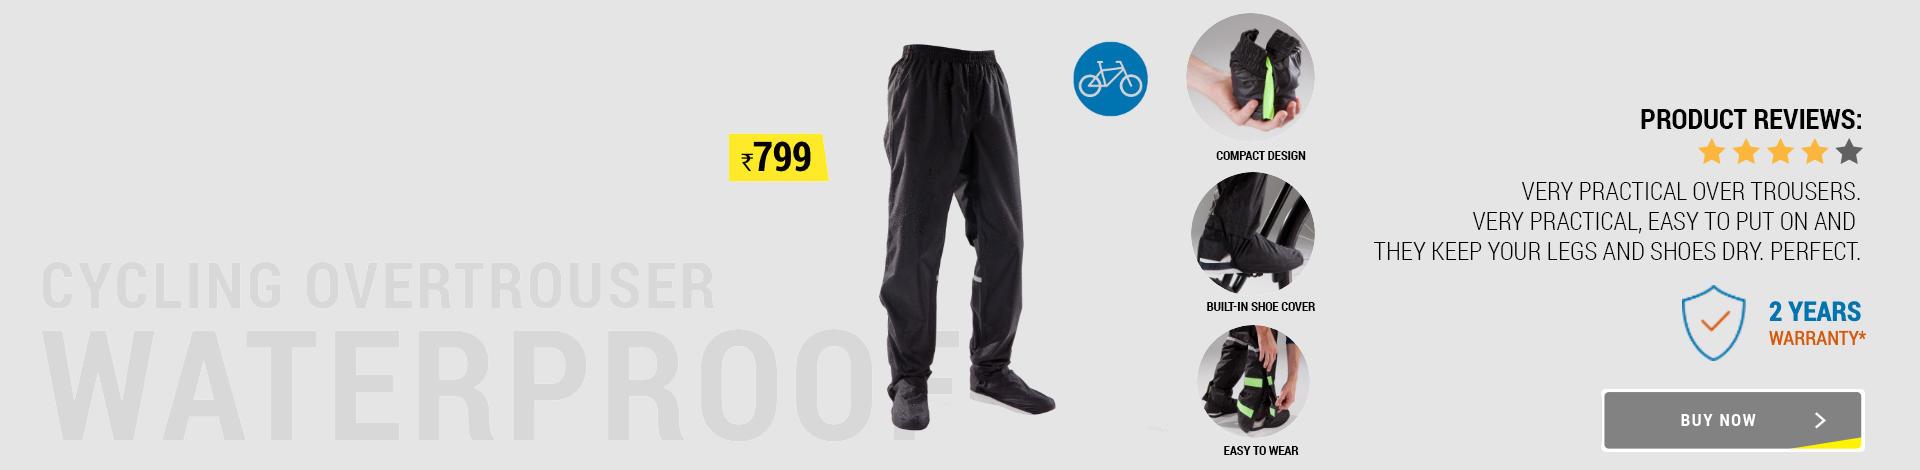 Rain Pants, water proof pant, cycling rain pant, over trousers